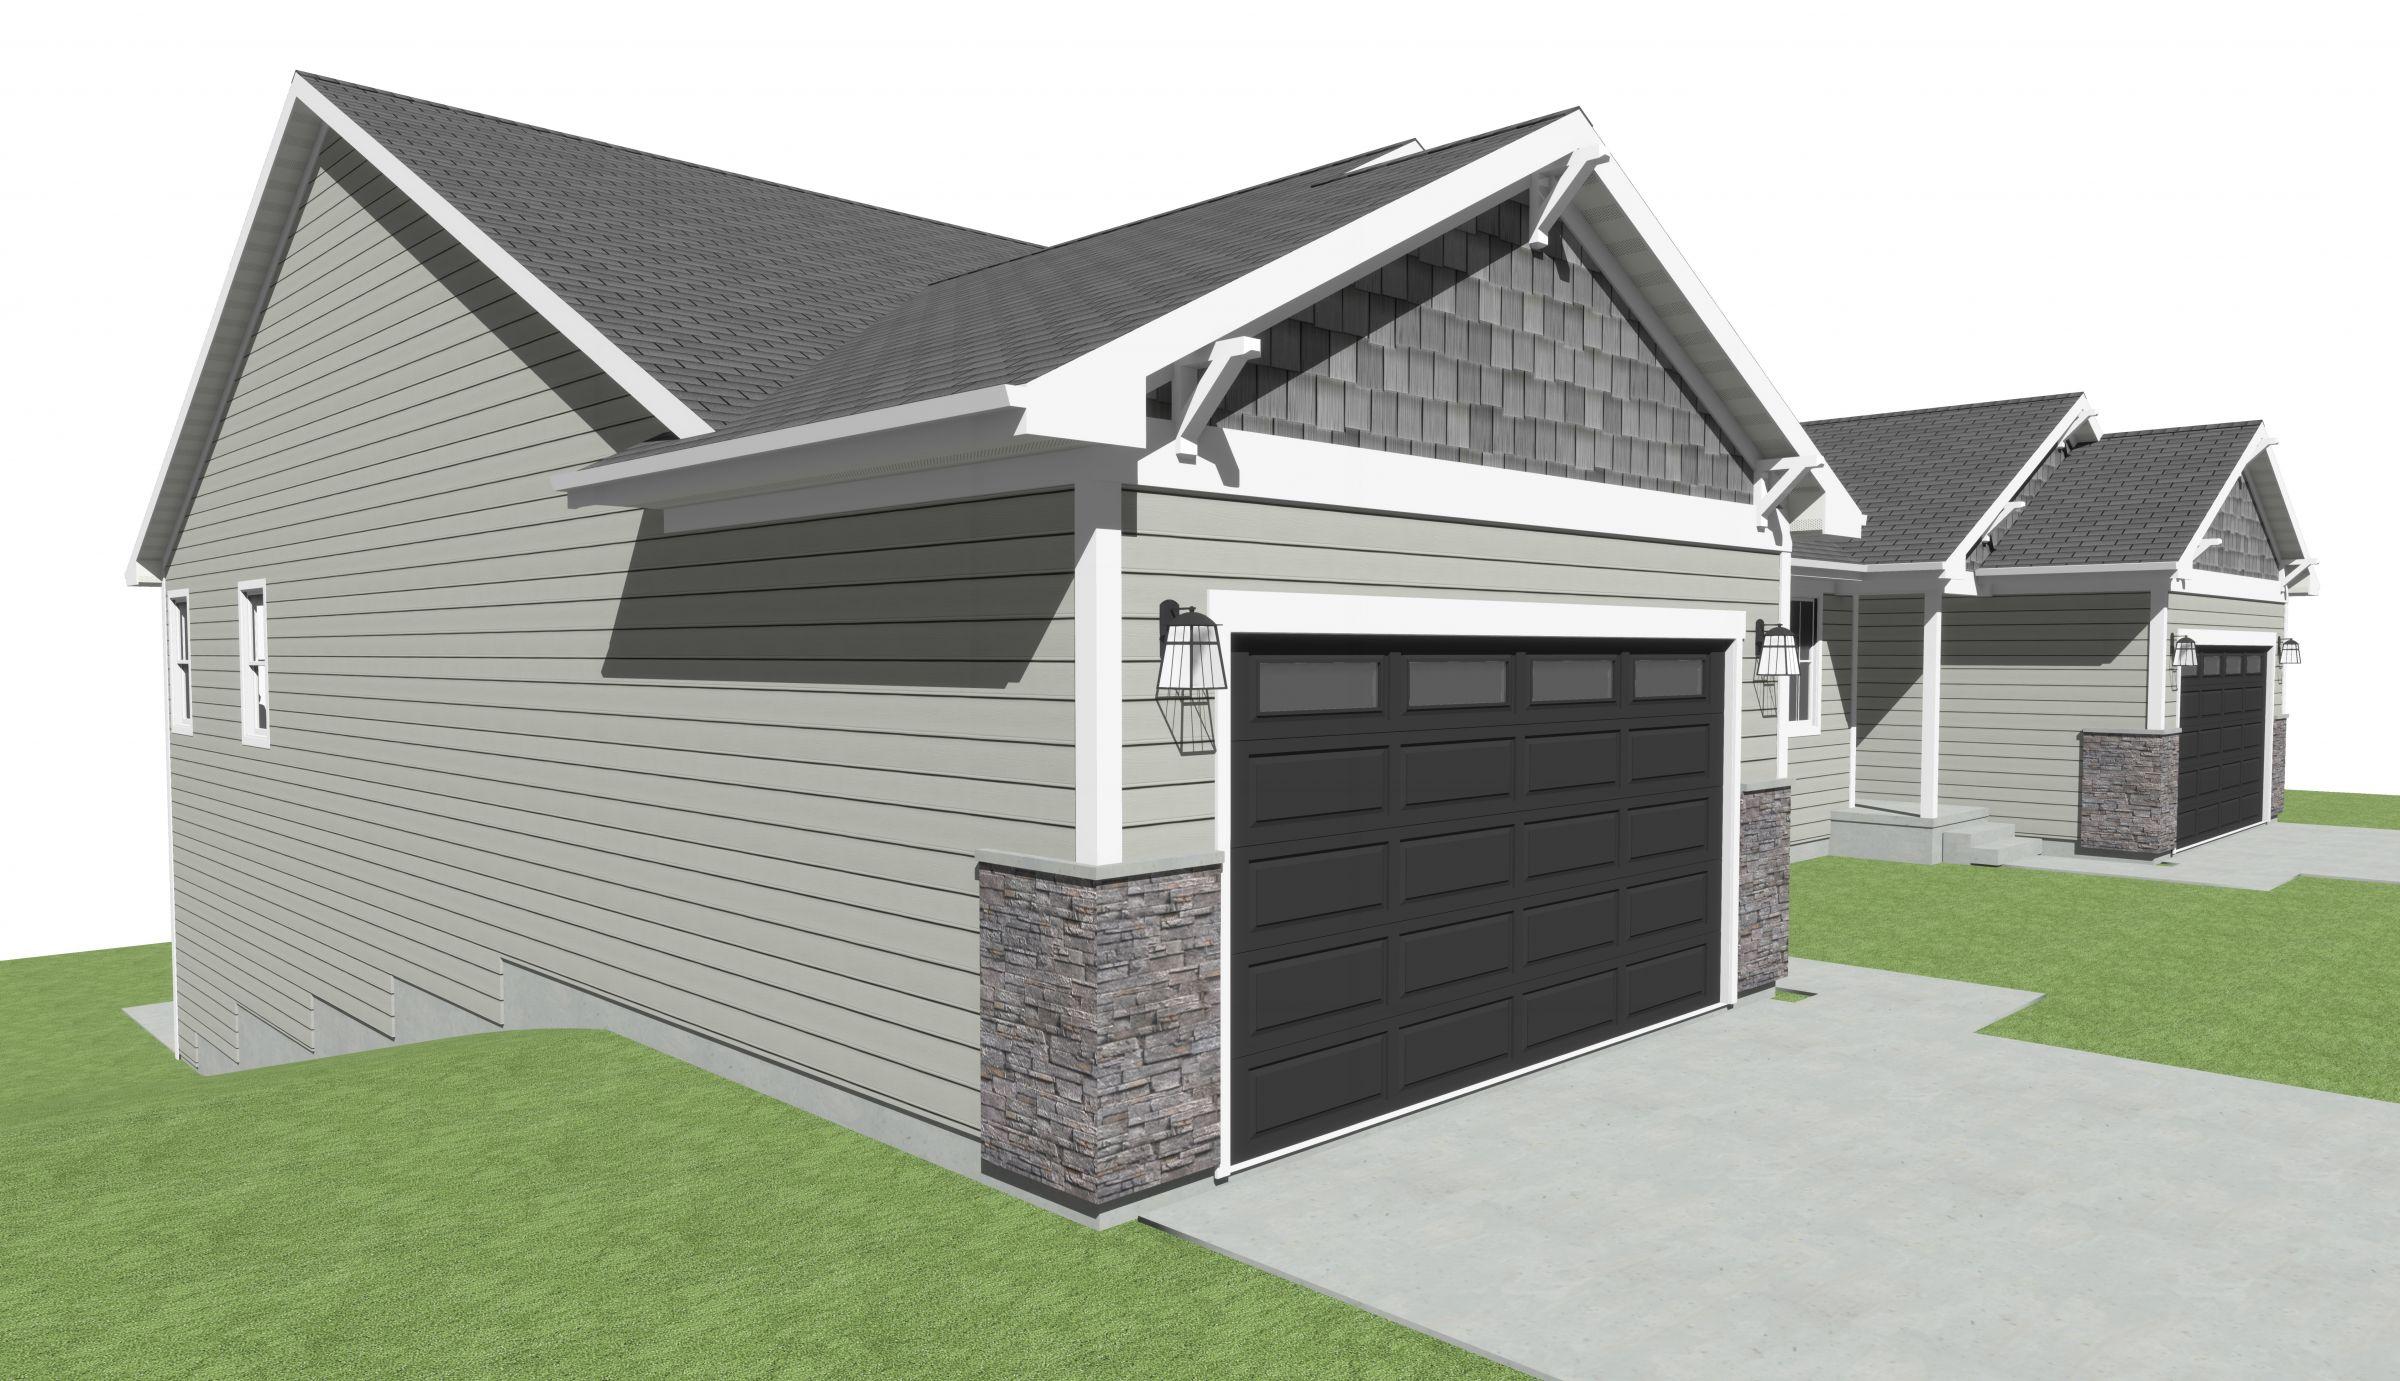 residential-warren-county-iowa-0-acres-listing-number-15420-2-2021-03-26-142432.jpg